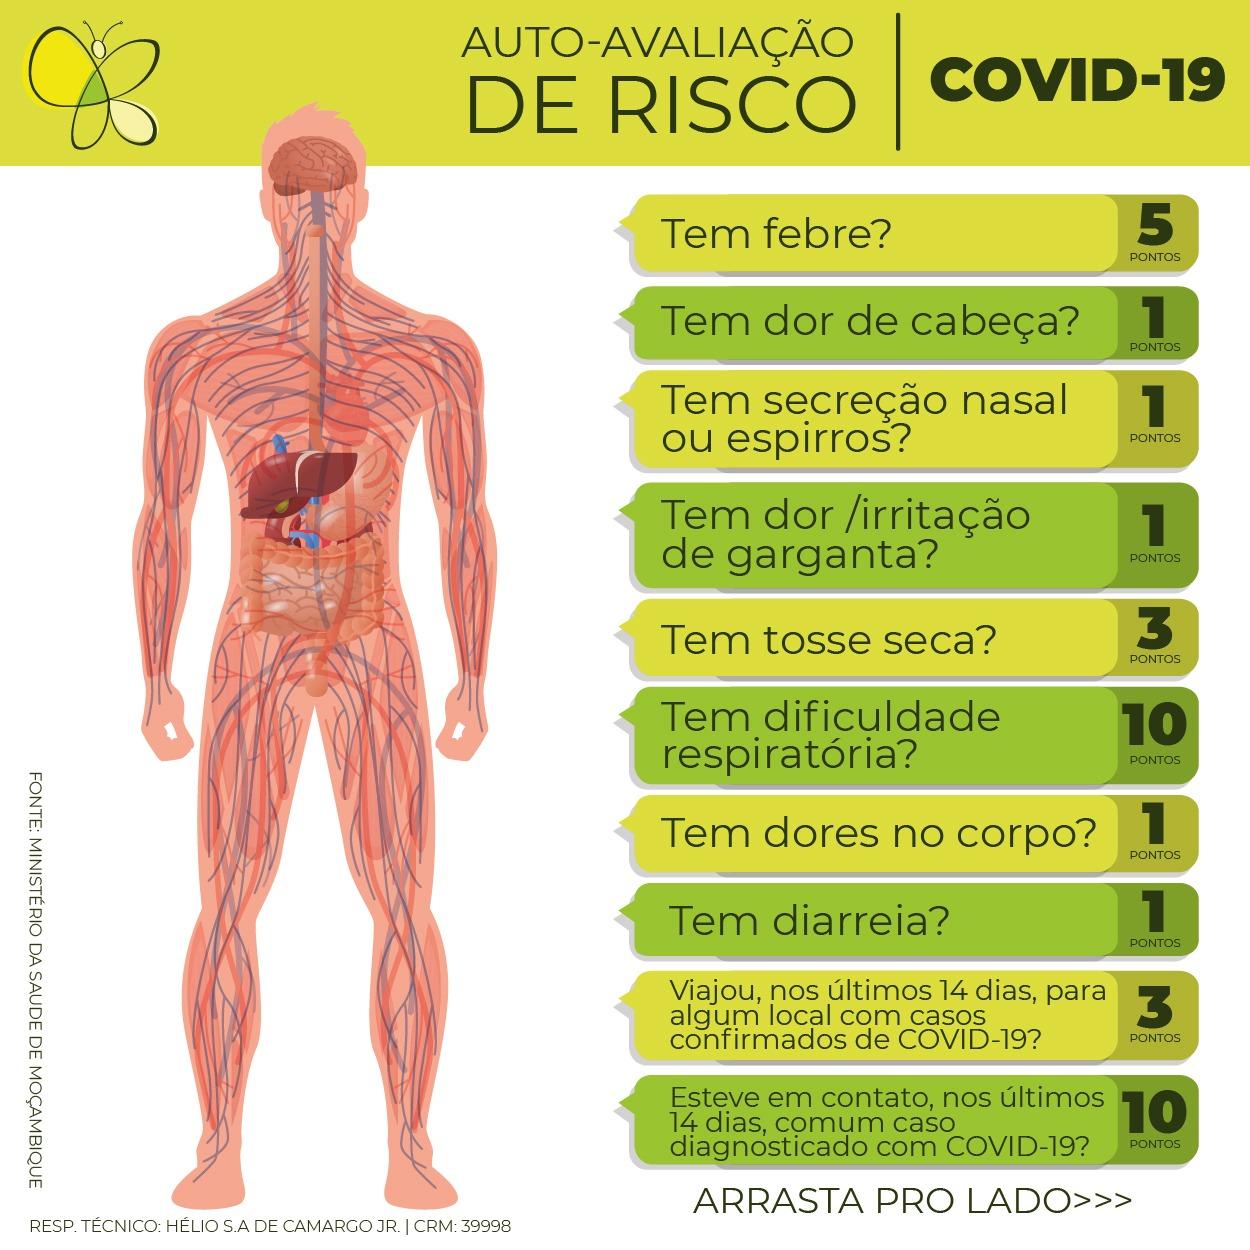 autoavaliação covid 19 coronavírus